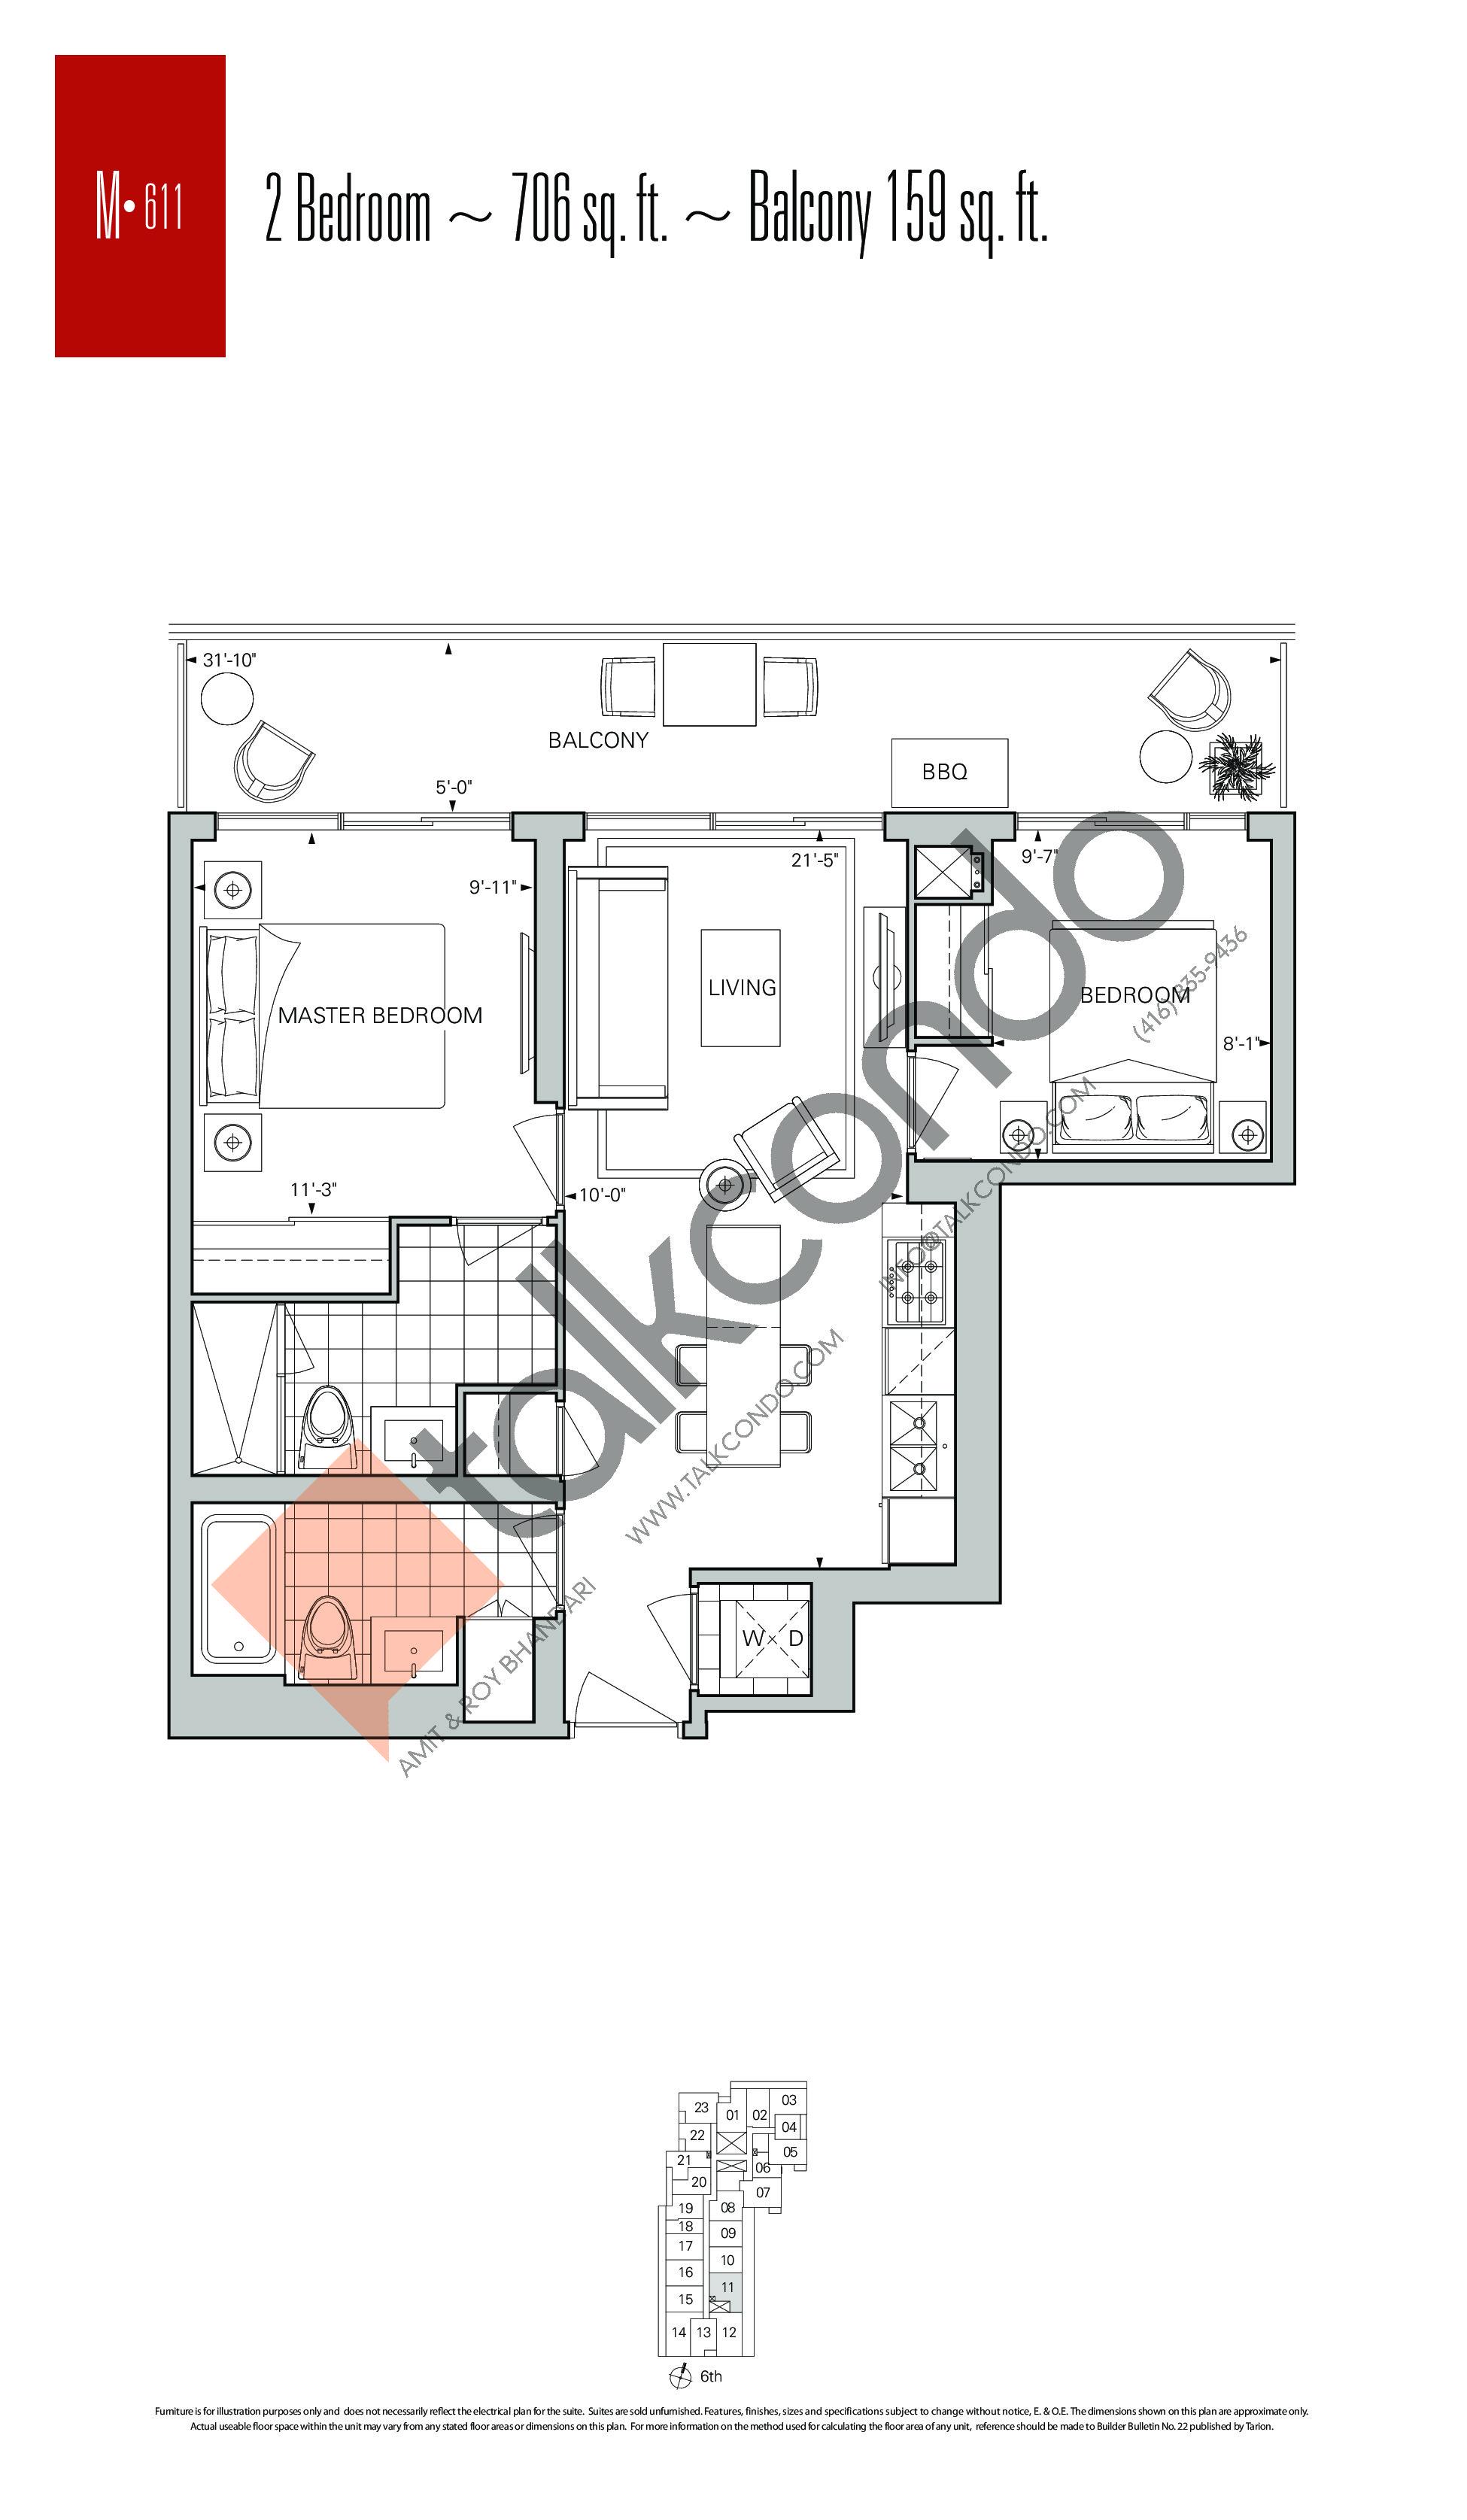 M-611 Floor Plan at Rise Condos - 706 sq.ft